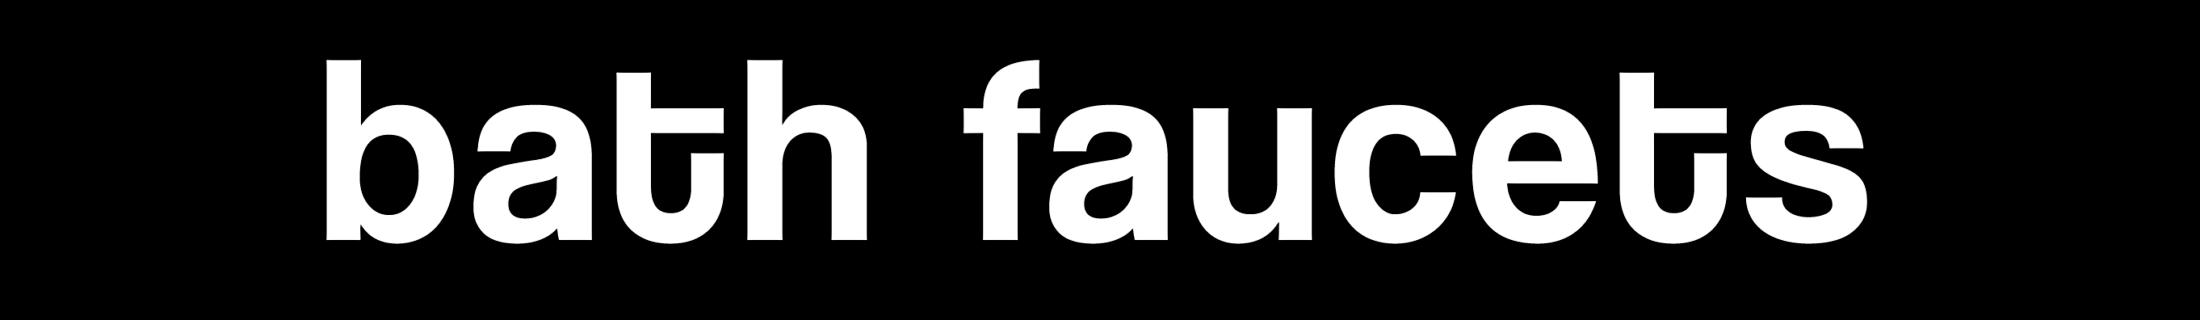 Bath Faucets Header Title